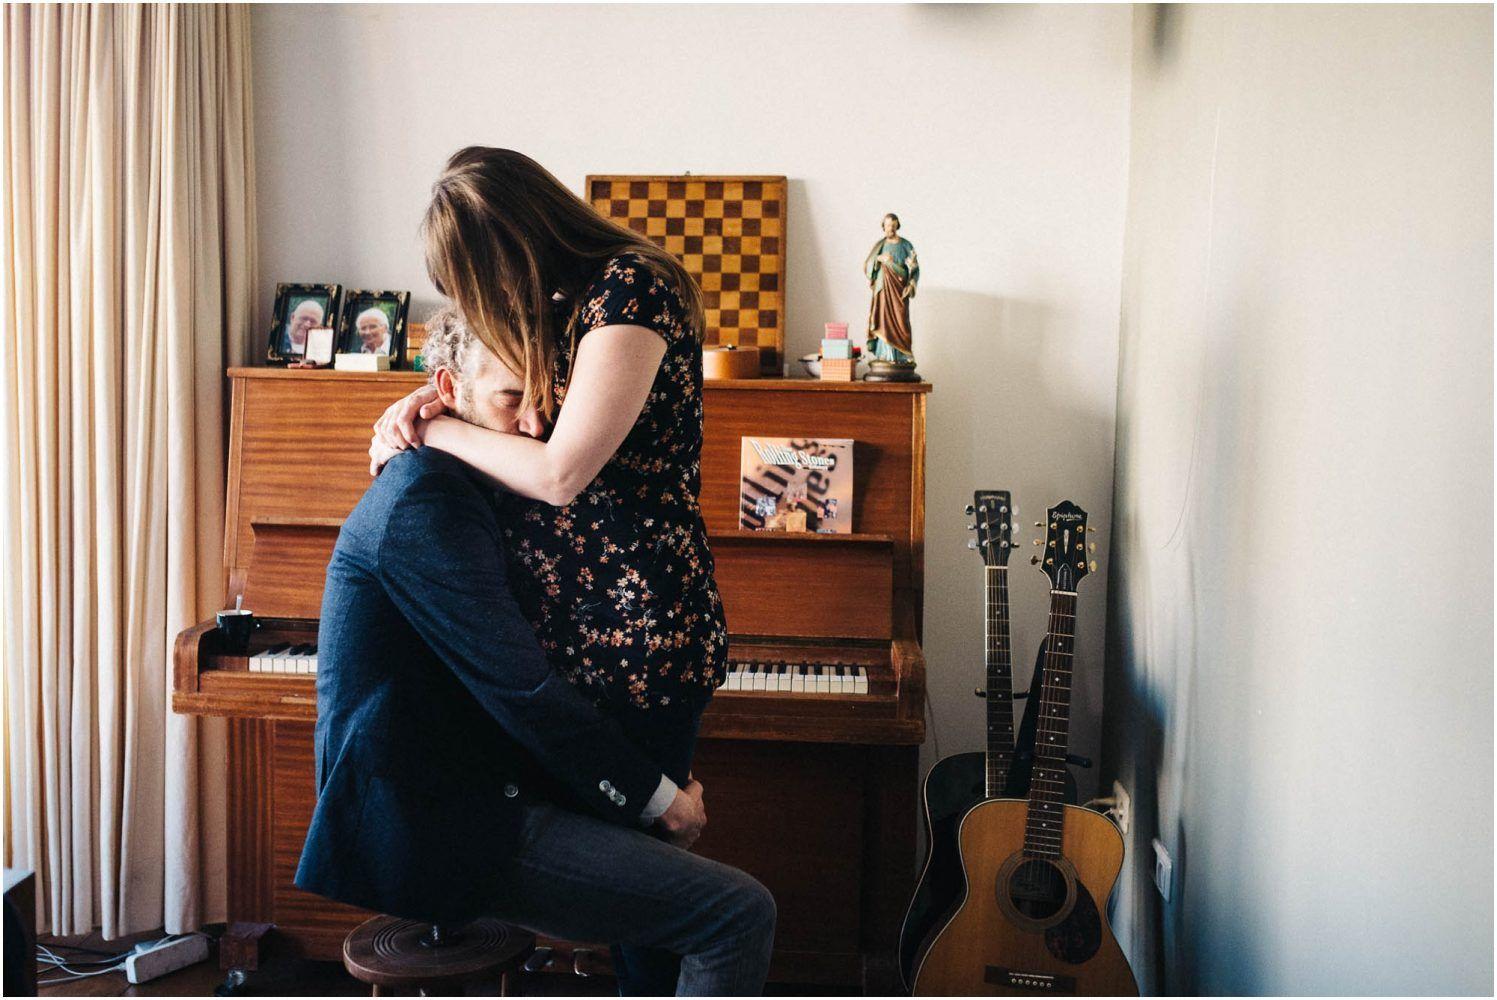 zwangerschapsfotografie thuis intiem - fotograaf zwangerschap Eindhvoen